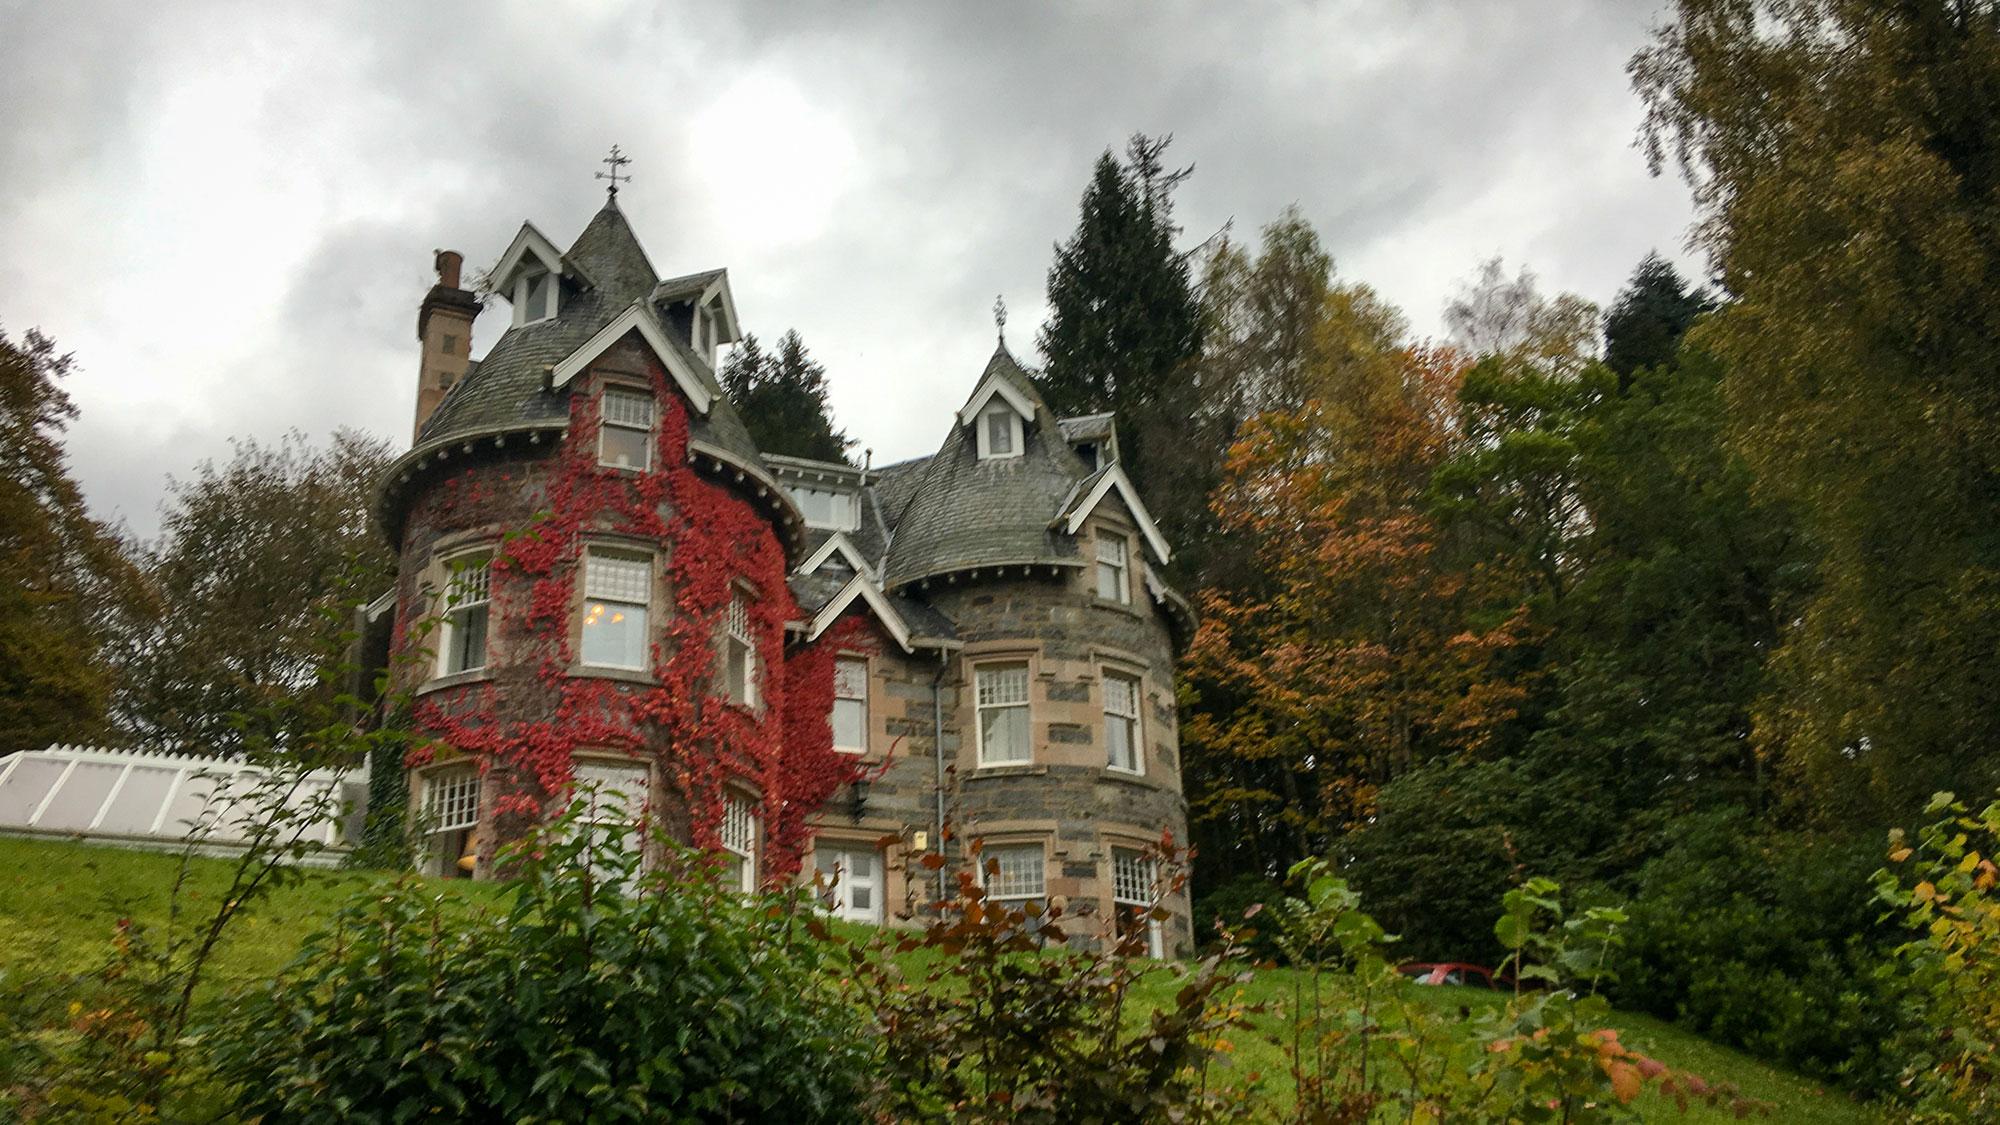 Strathtay Gästehaus mit rotem Efeu